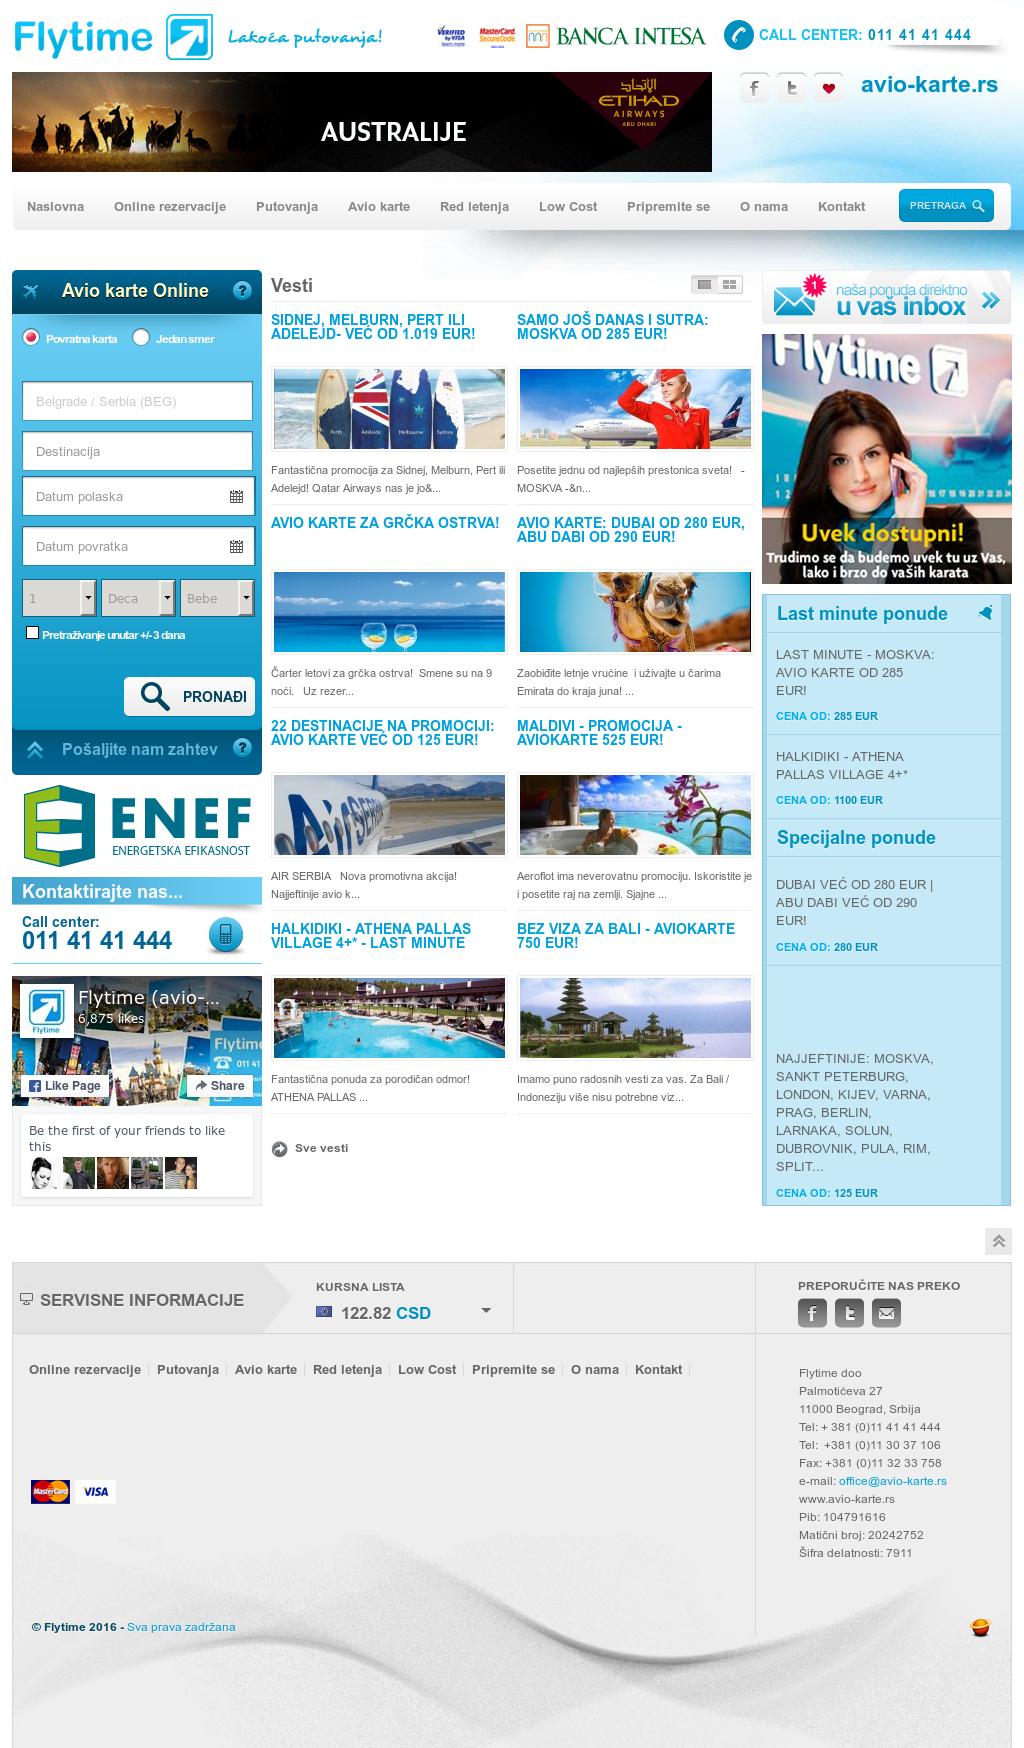 Avionske Karte.Flytime Avio Karte Rs Competitors Revenue And Employees Owler